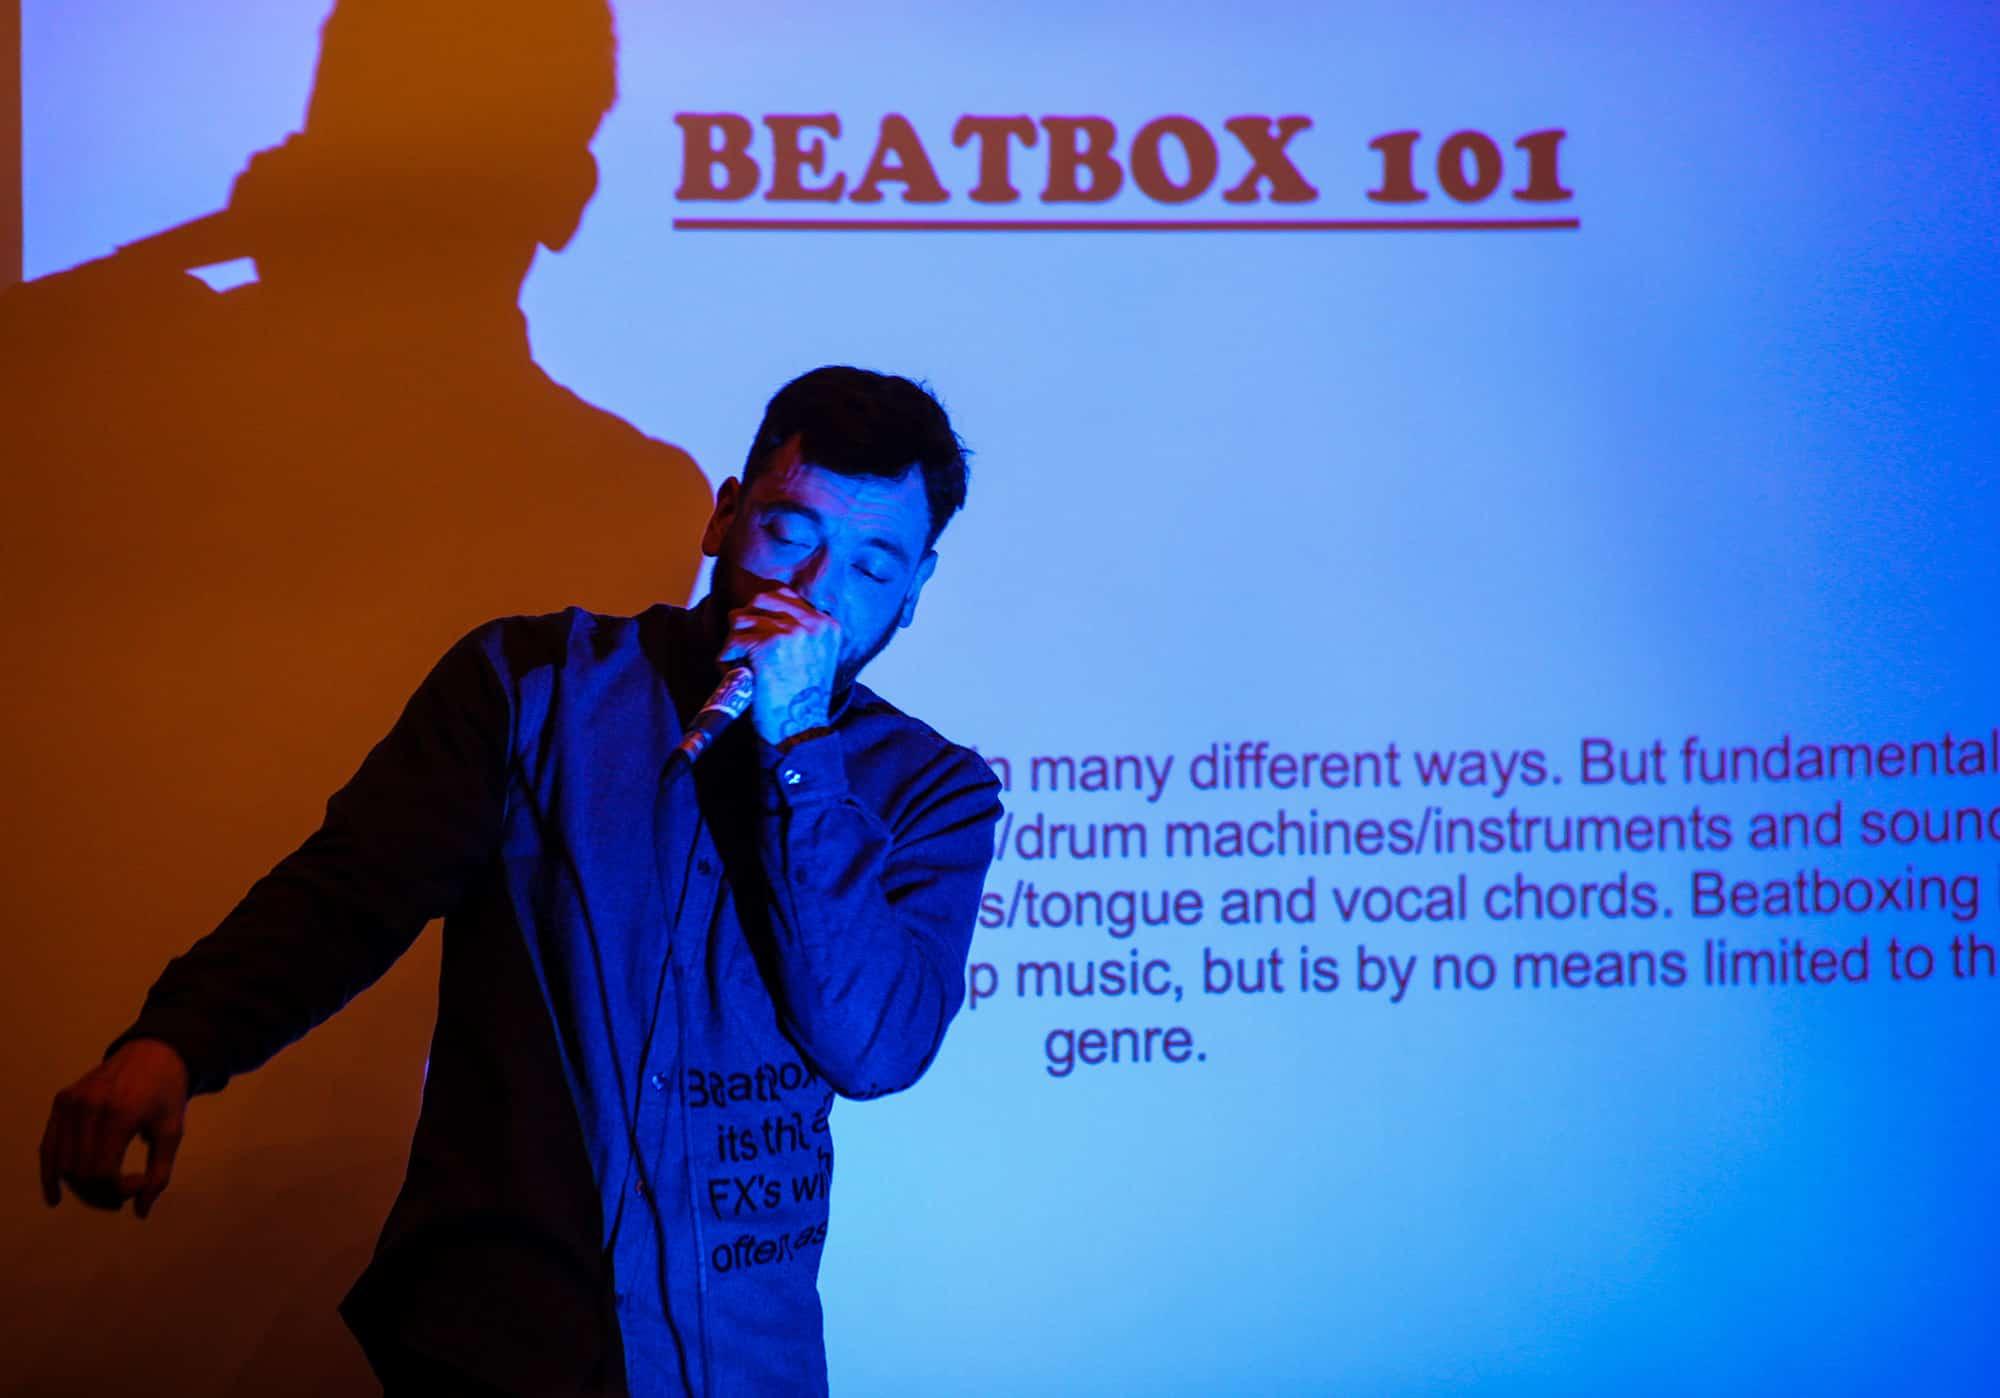 Human beatboxing person